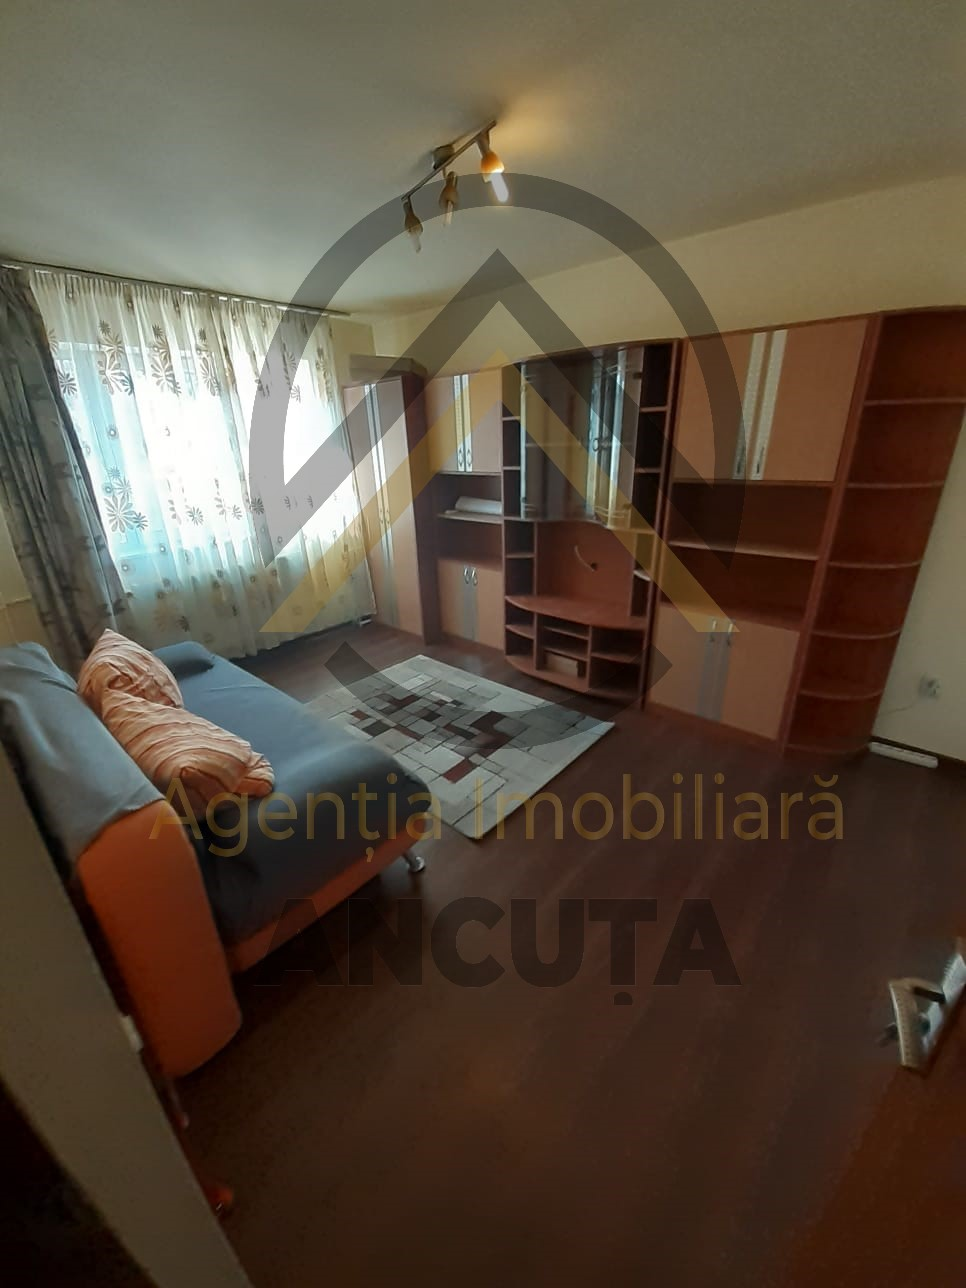 188539-Inchiriere apartament 2 camere, Manastur, Cluj-Napoca